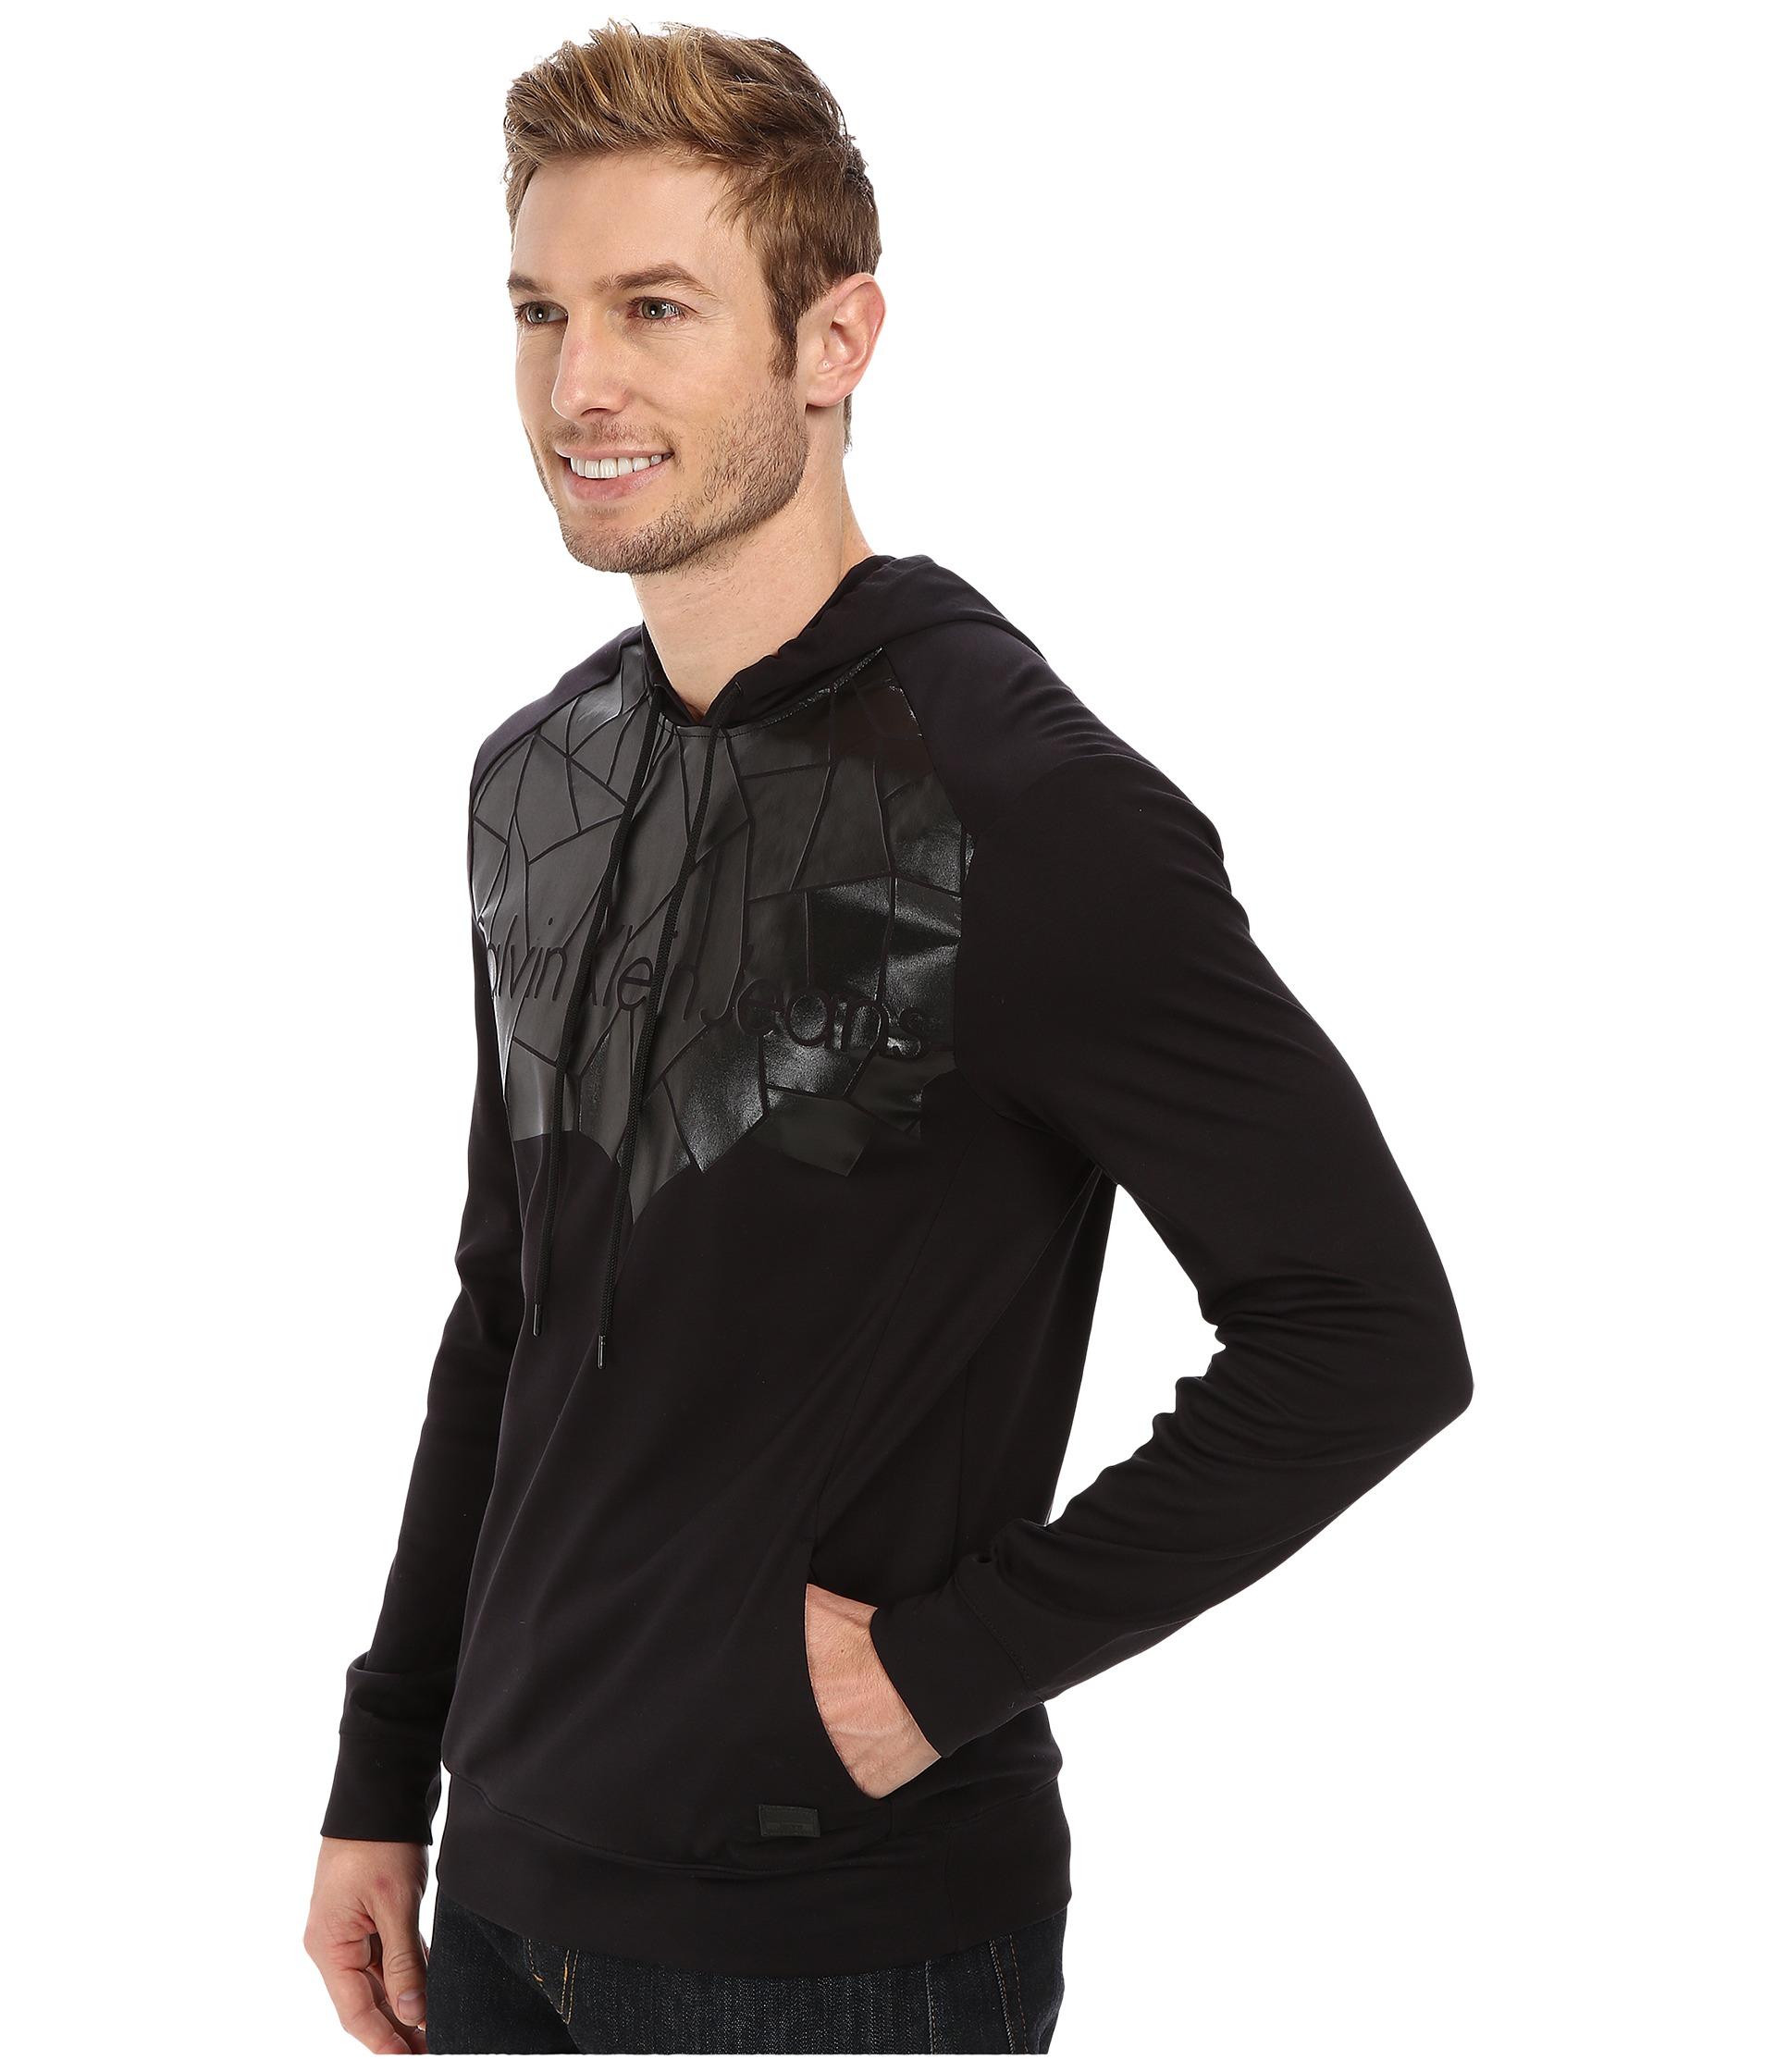 calvin klein jeans interlock logo hoodie in black black 050000 lyst. Black Bedroom Furniture Sets. Home Design Ideas